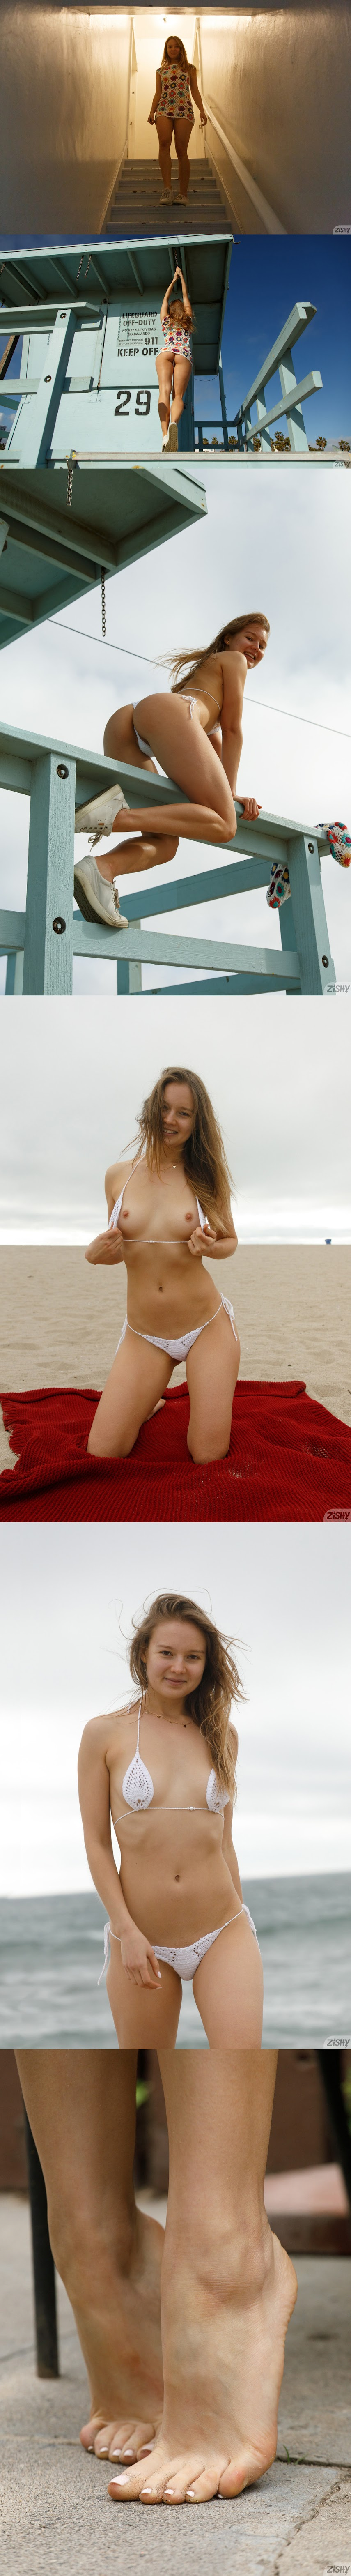 [Zishy] Isabella Herzog - Autumn In LA sexy girls image jav